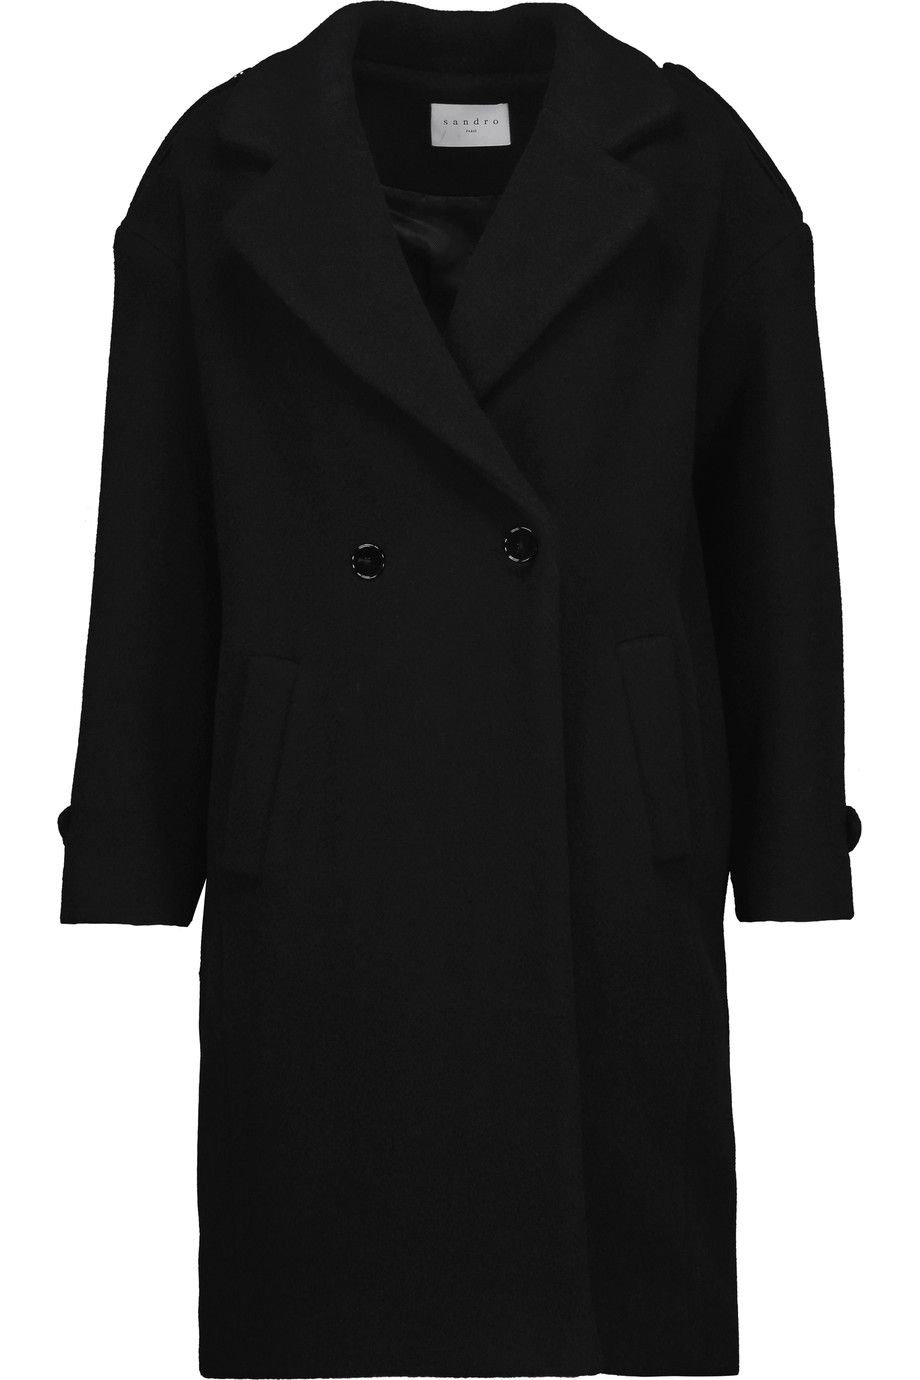 Designer Coats Cheap | Shop On Sale Sandro Dory Wool Blend Felt Coat Browse Other Discount